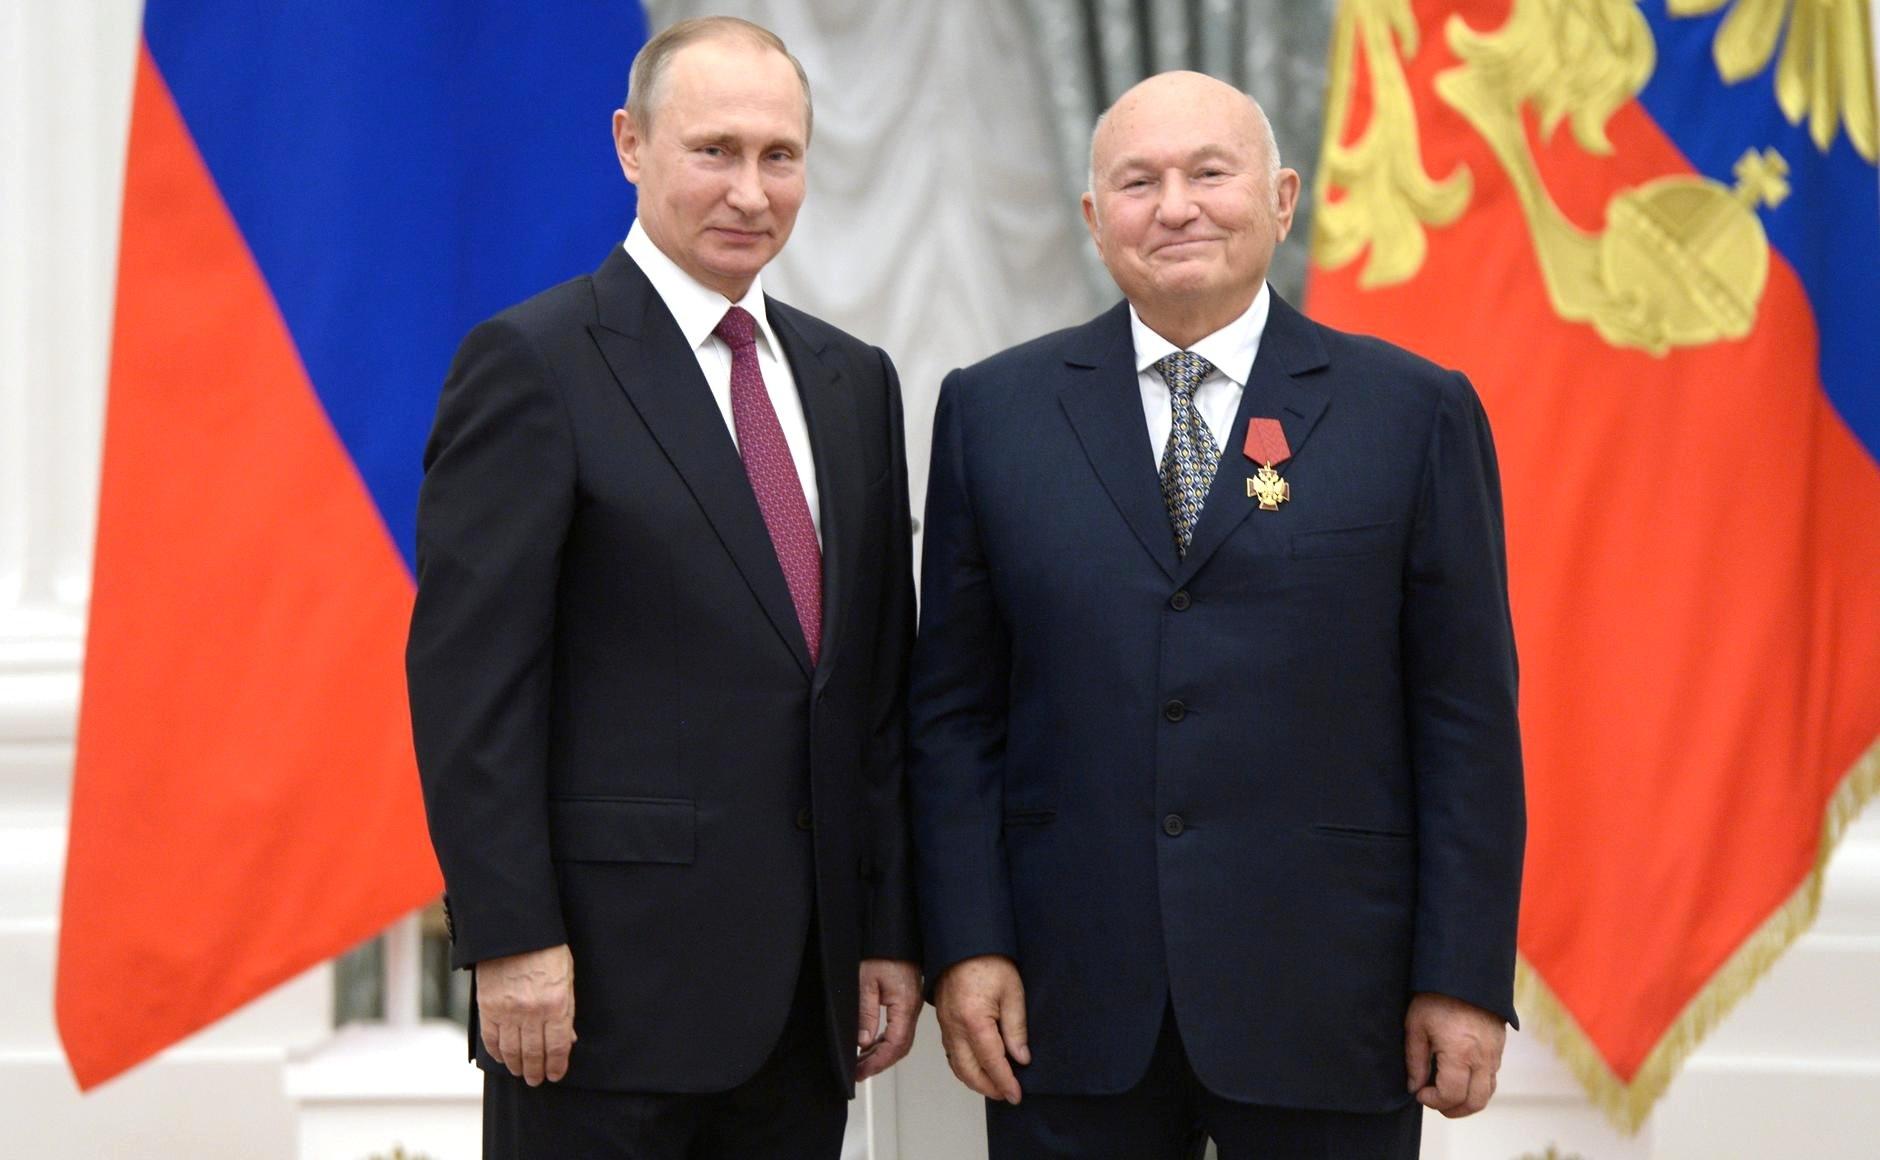 Президент РФ Владимир Путин и Юрий Лужков. Фото: Kremlin.ru